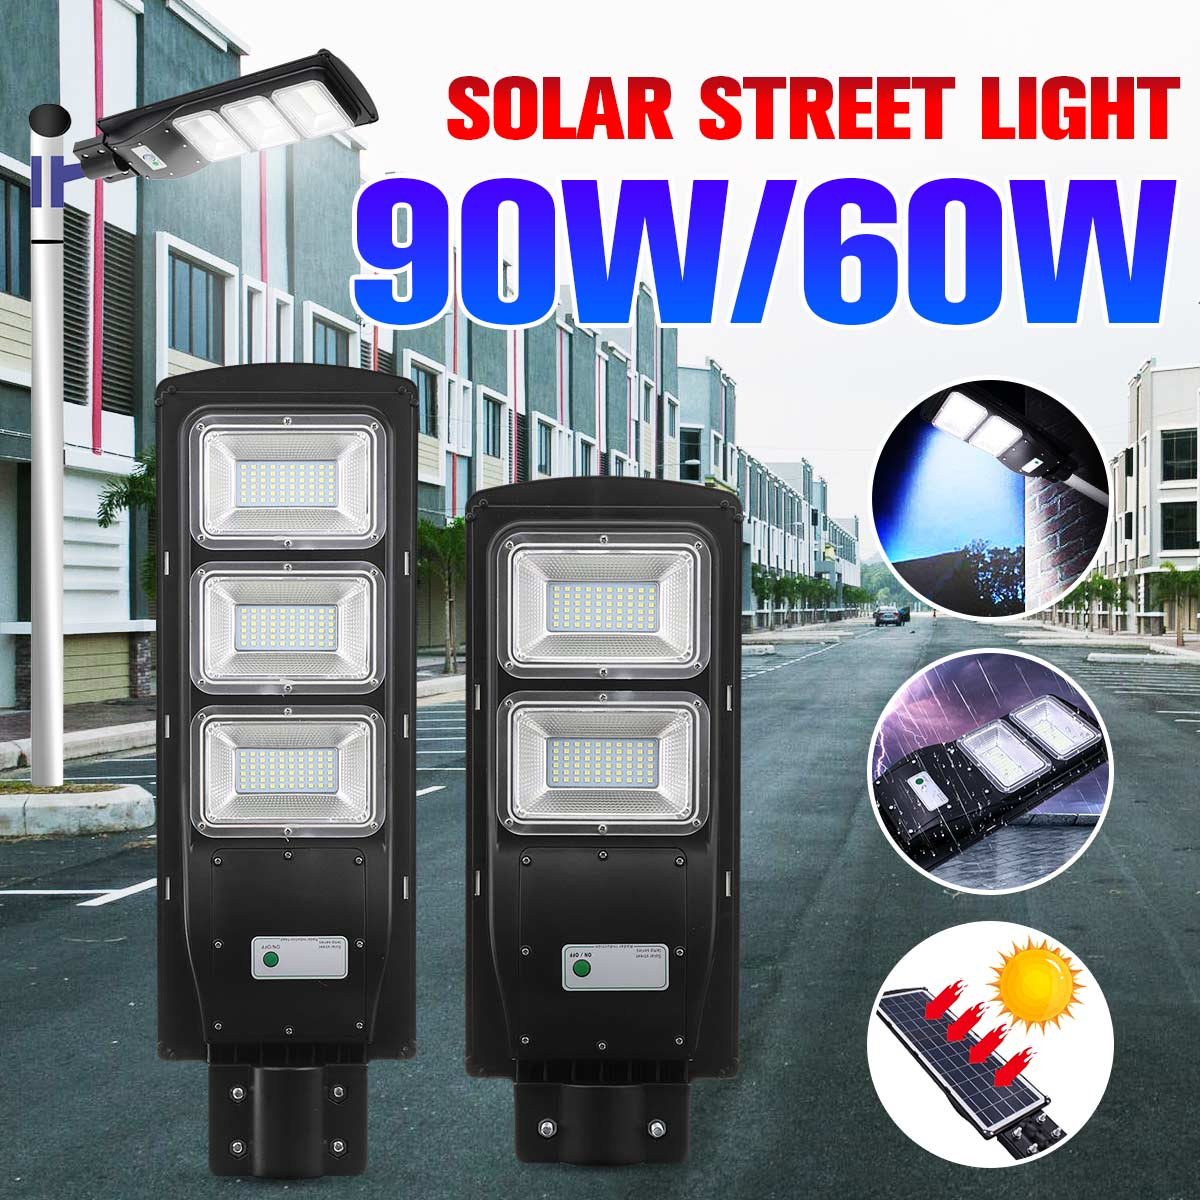 60W 90W LED Solar Street Light Radar With PIR Motion Sensor Outdoor Lighting IP67 Wall Lamps Solar Landscape Garden Lights